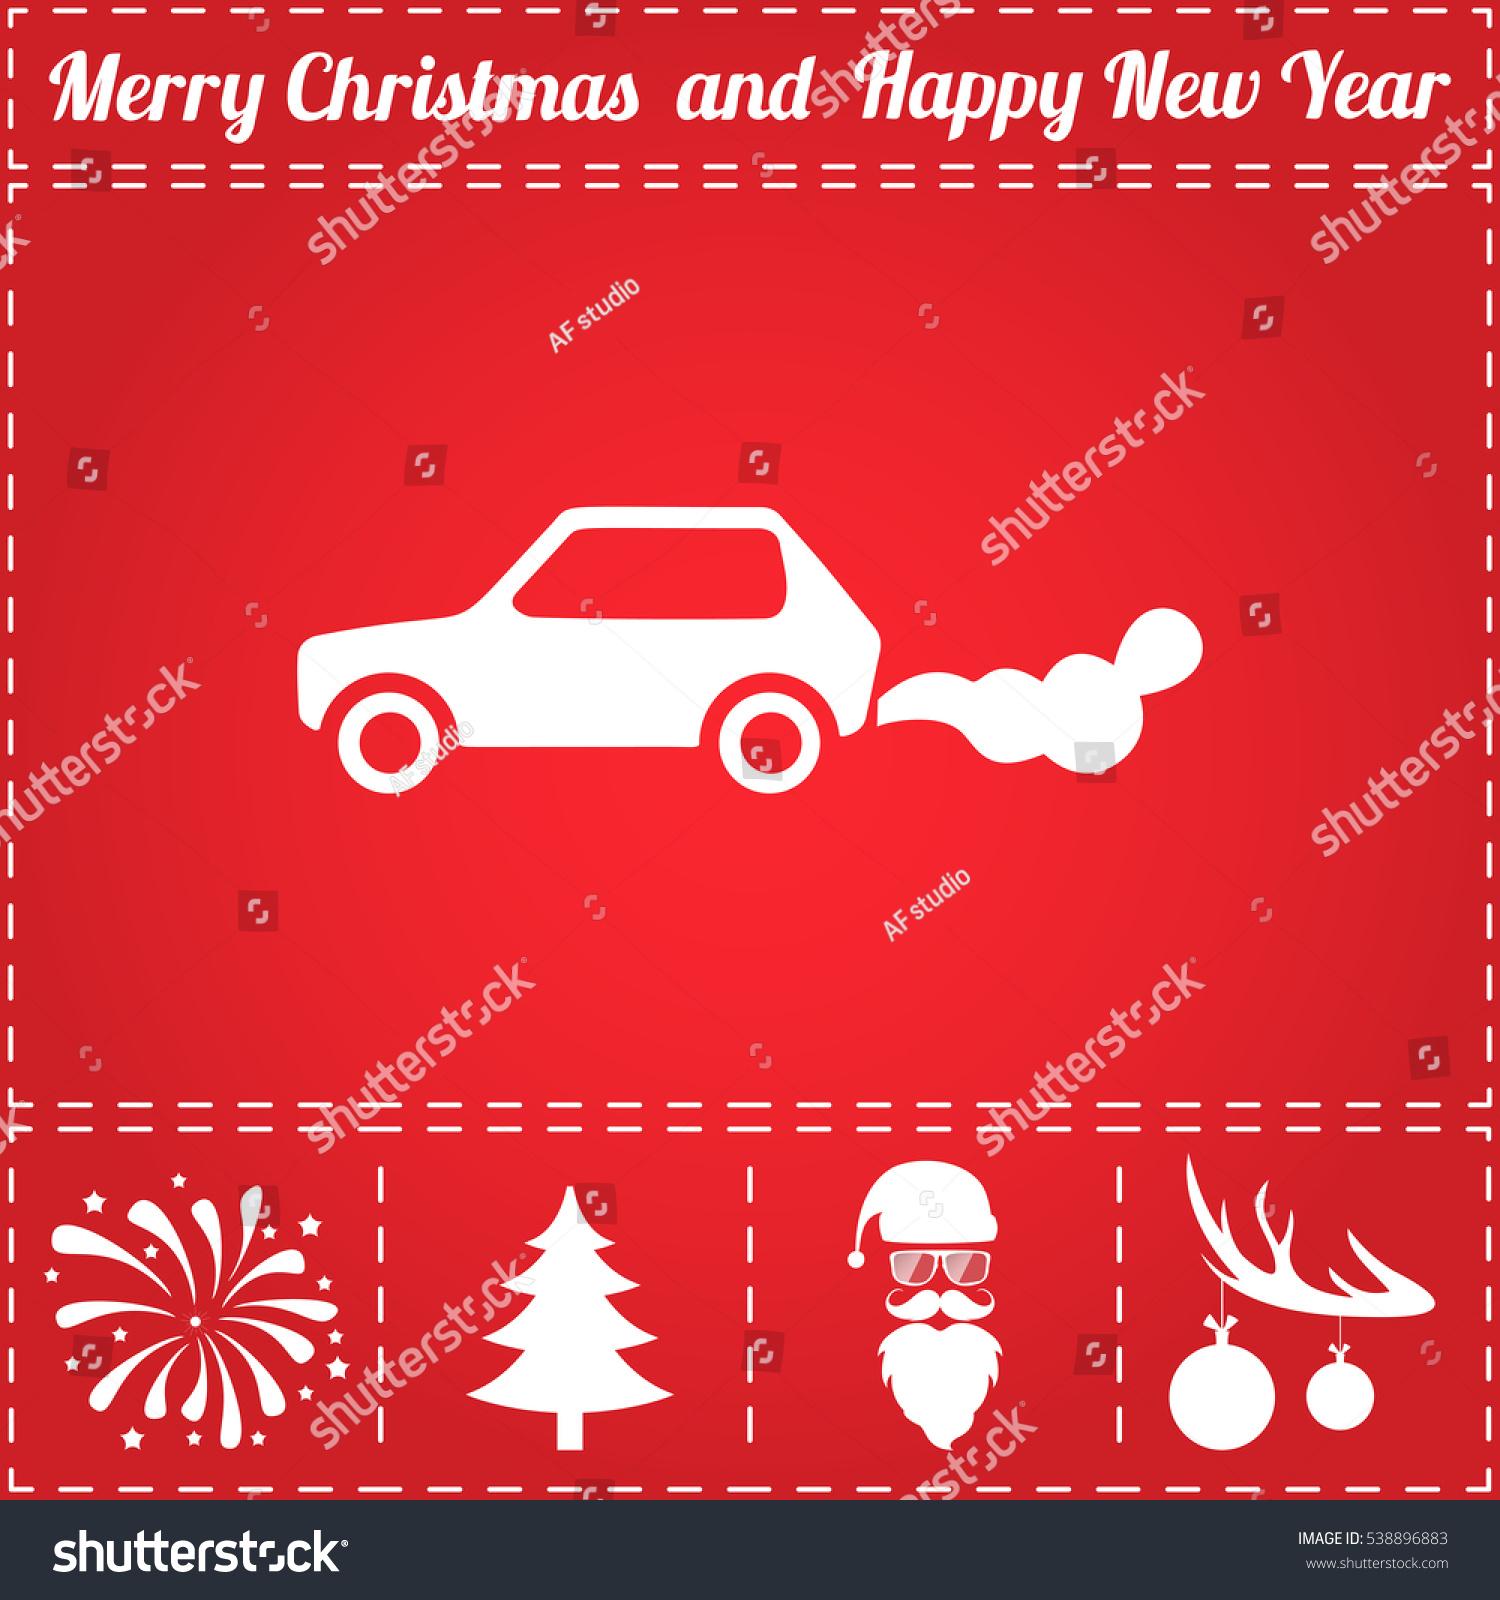 Car emits carbon dioxide flat symbol stock illustration 538896883 car emits carbon dioxide flat symbol and bonus icons for new year santa claus buycottarizona Images